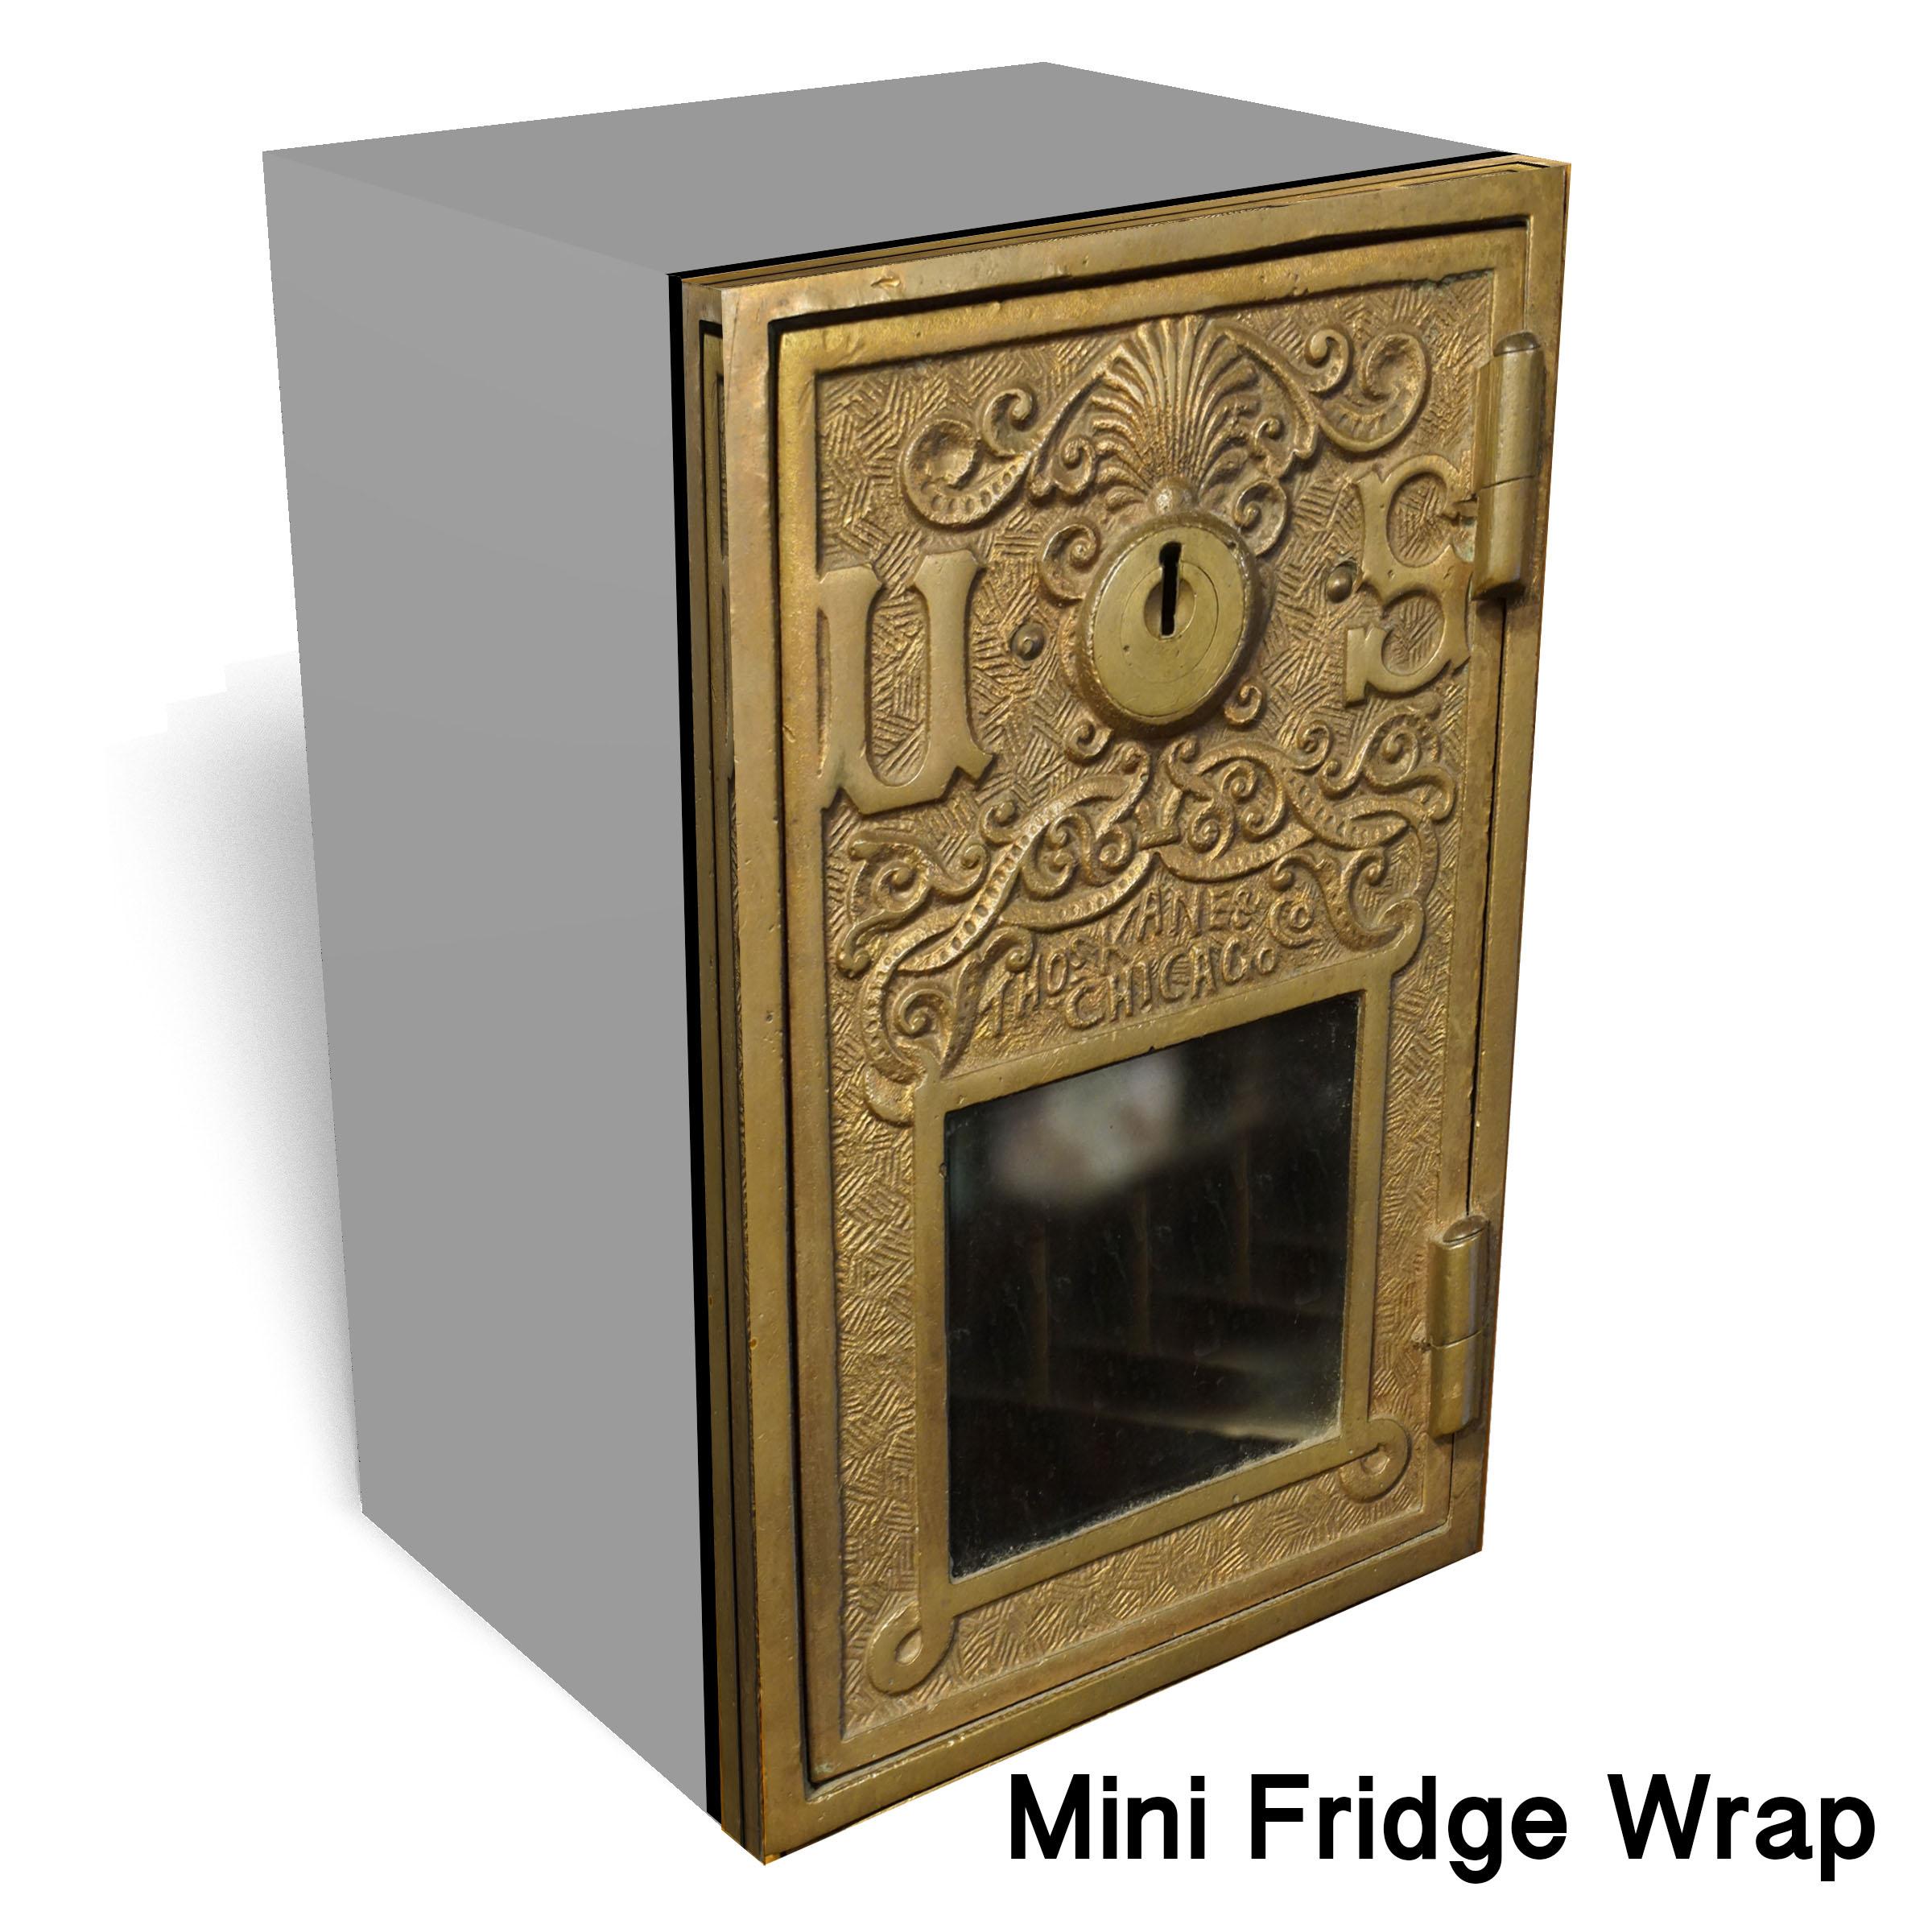 Post office box Mini fridge wrap